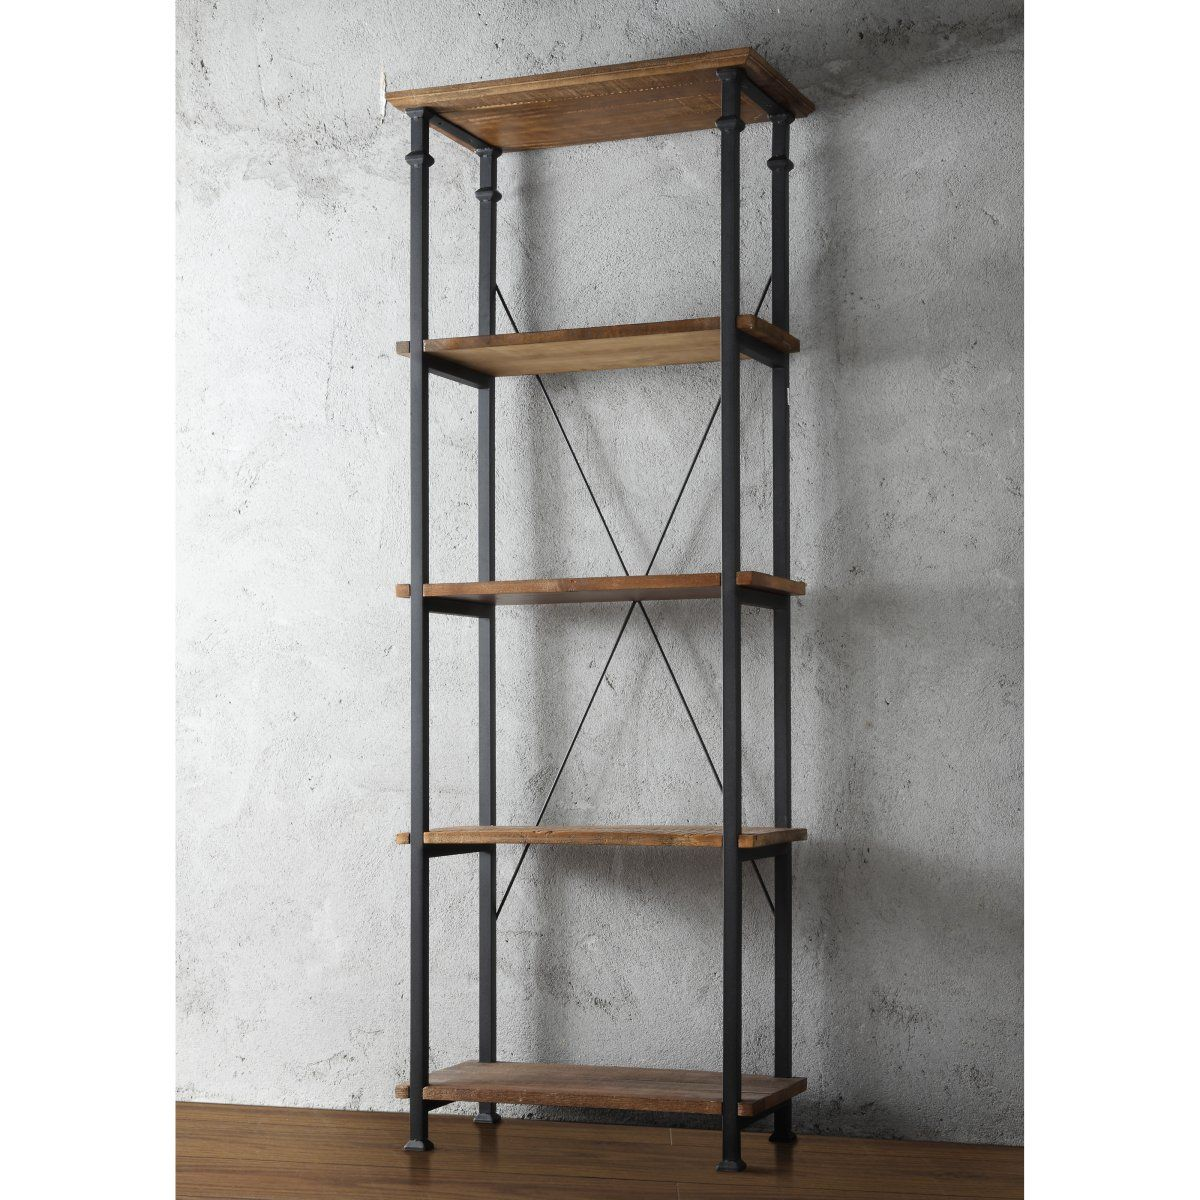 Homelegance Factory Bookcase Www Hayneedle Com Rustic Bookcase Rustic Bookshelf Industrial Bookcases